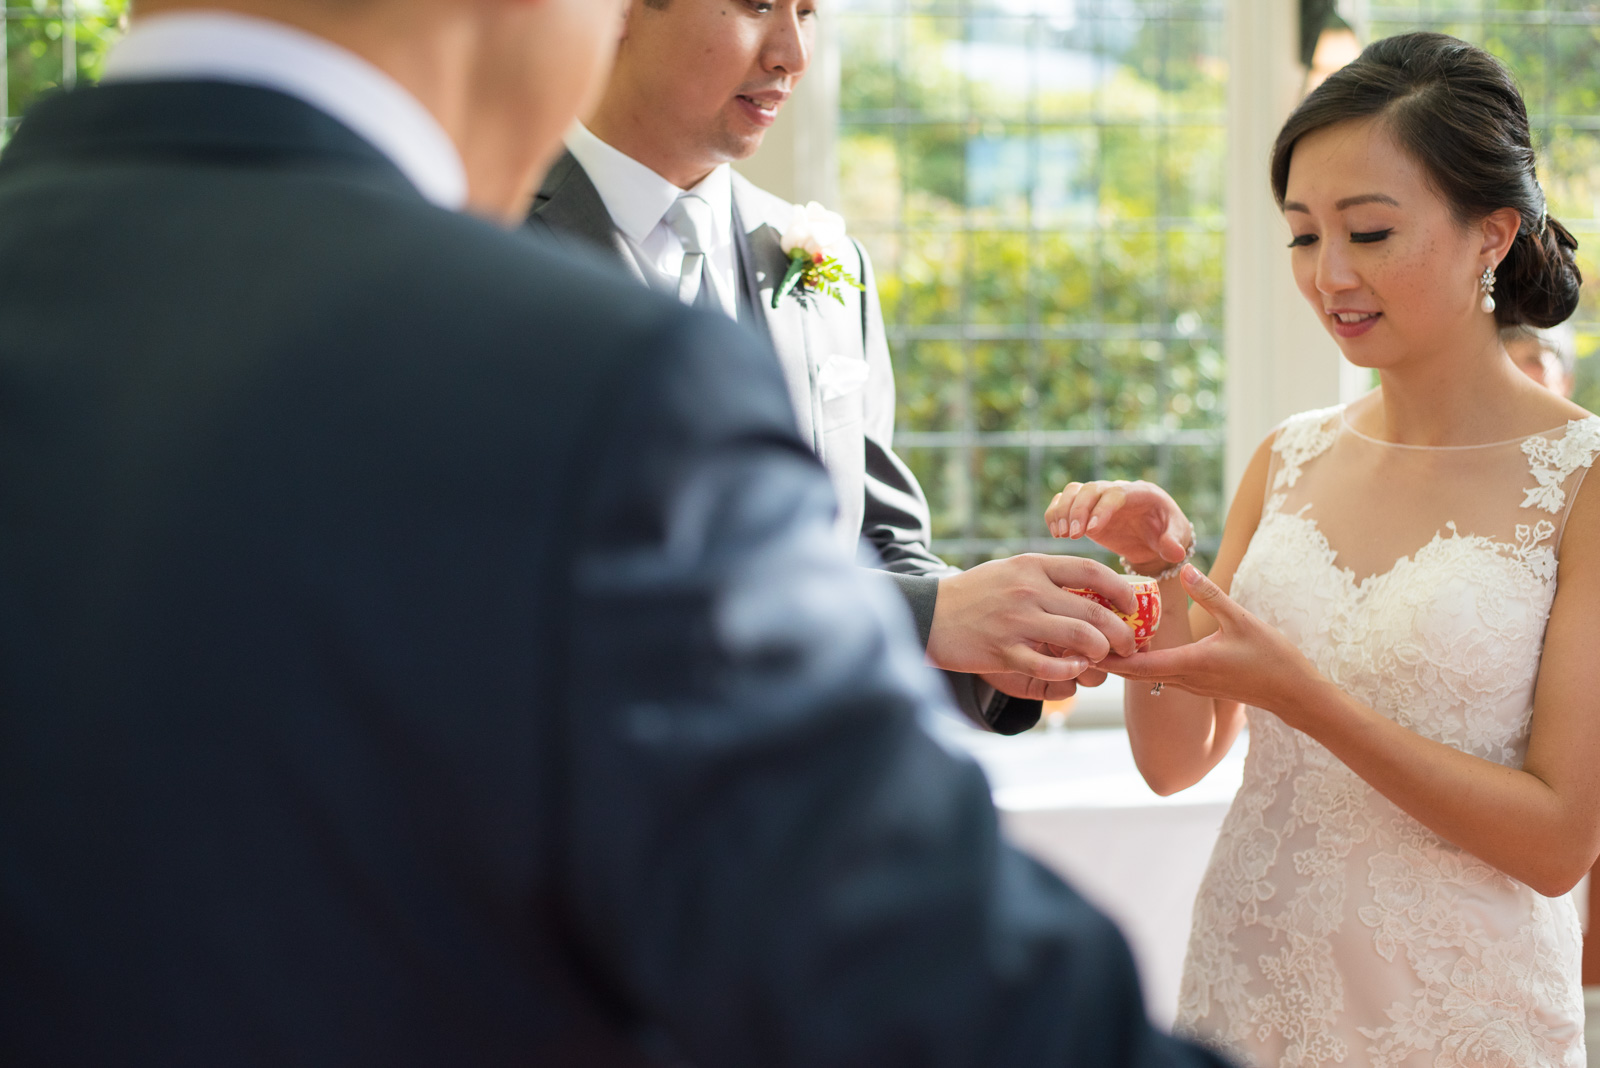 victoria-wedding-photographers-cecil-green-park-house-wedding-30.jpg